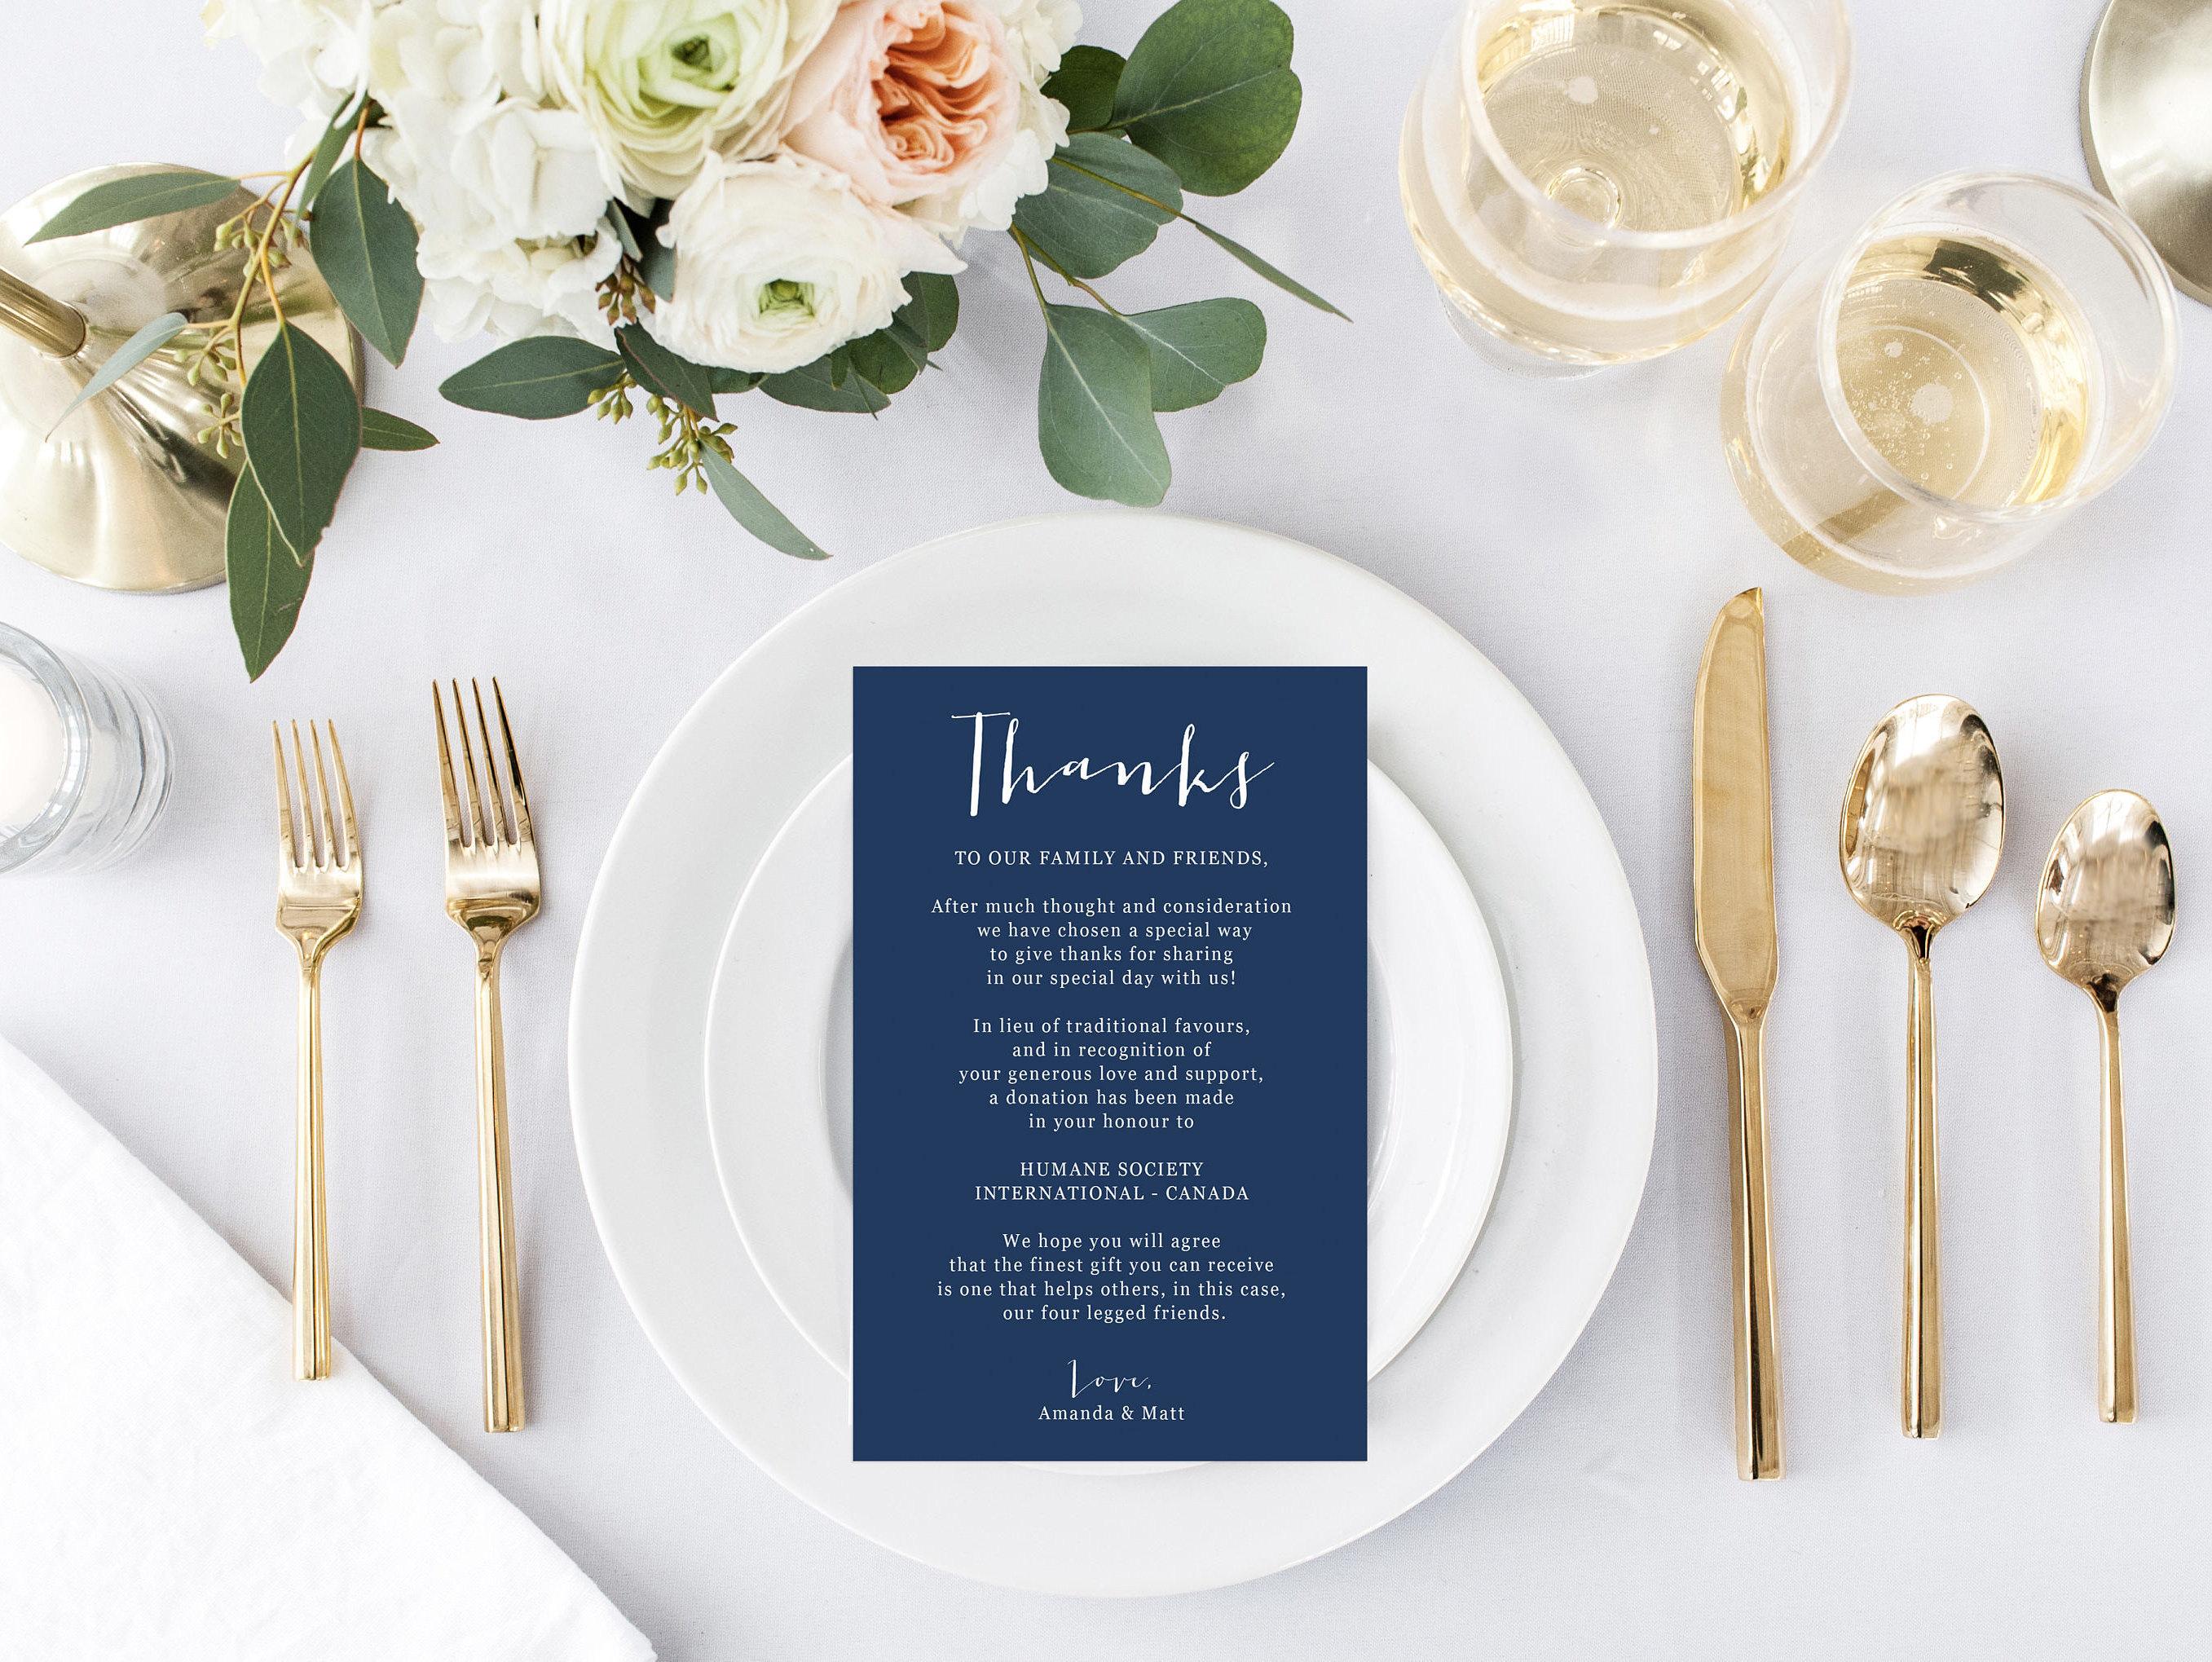 Funky Wedding Favor Ideas Canada Mold - Blue Wedding Color Ideas ...